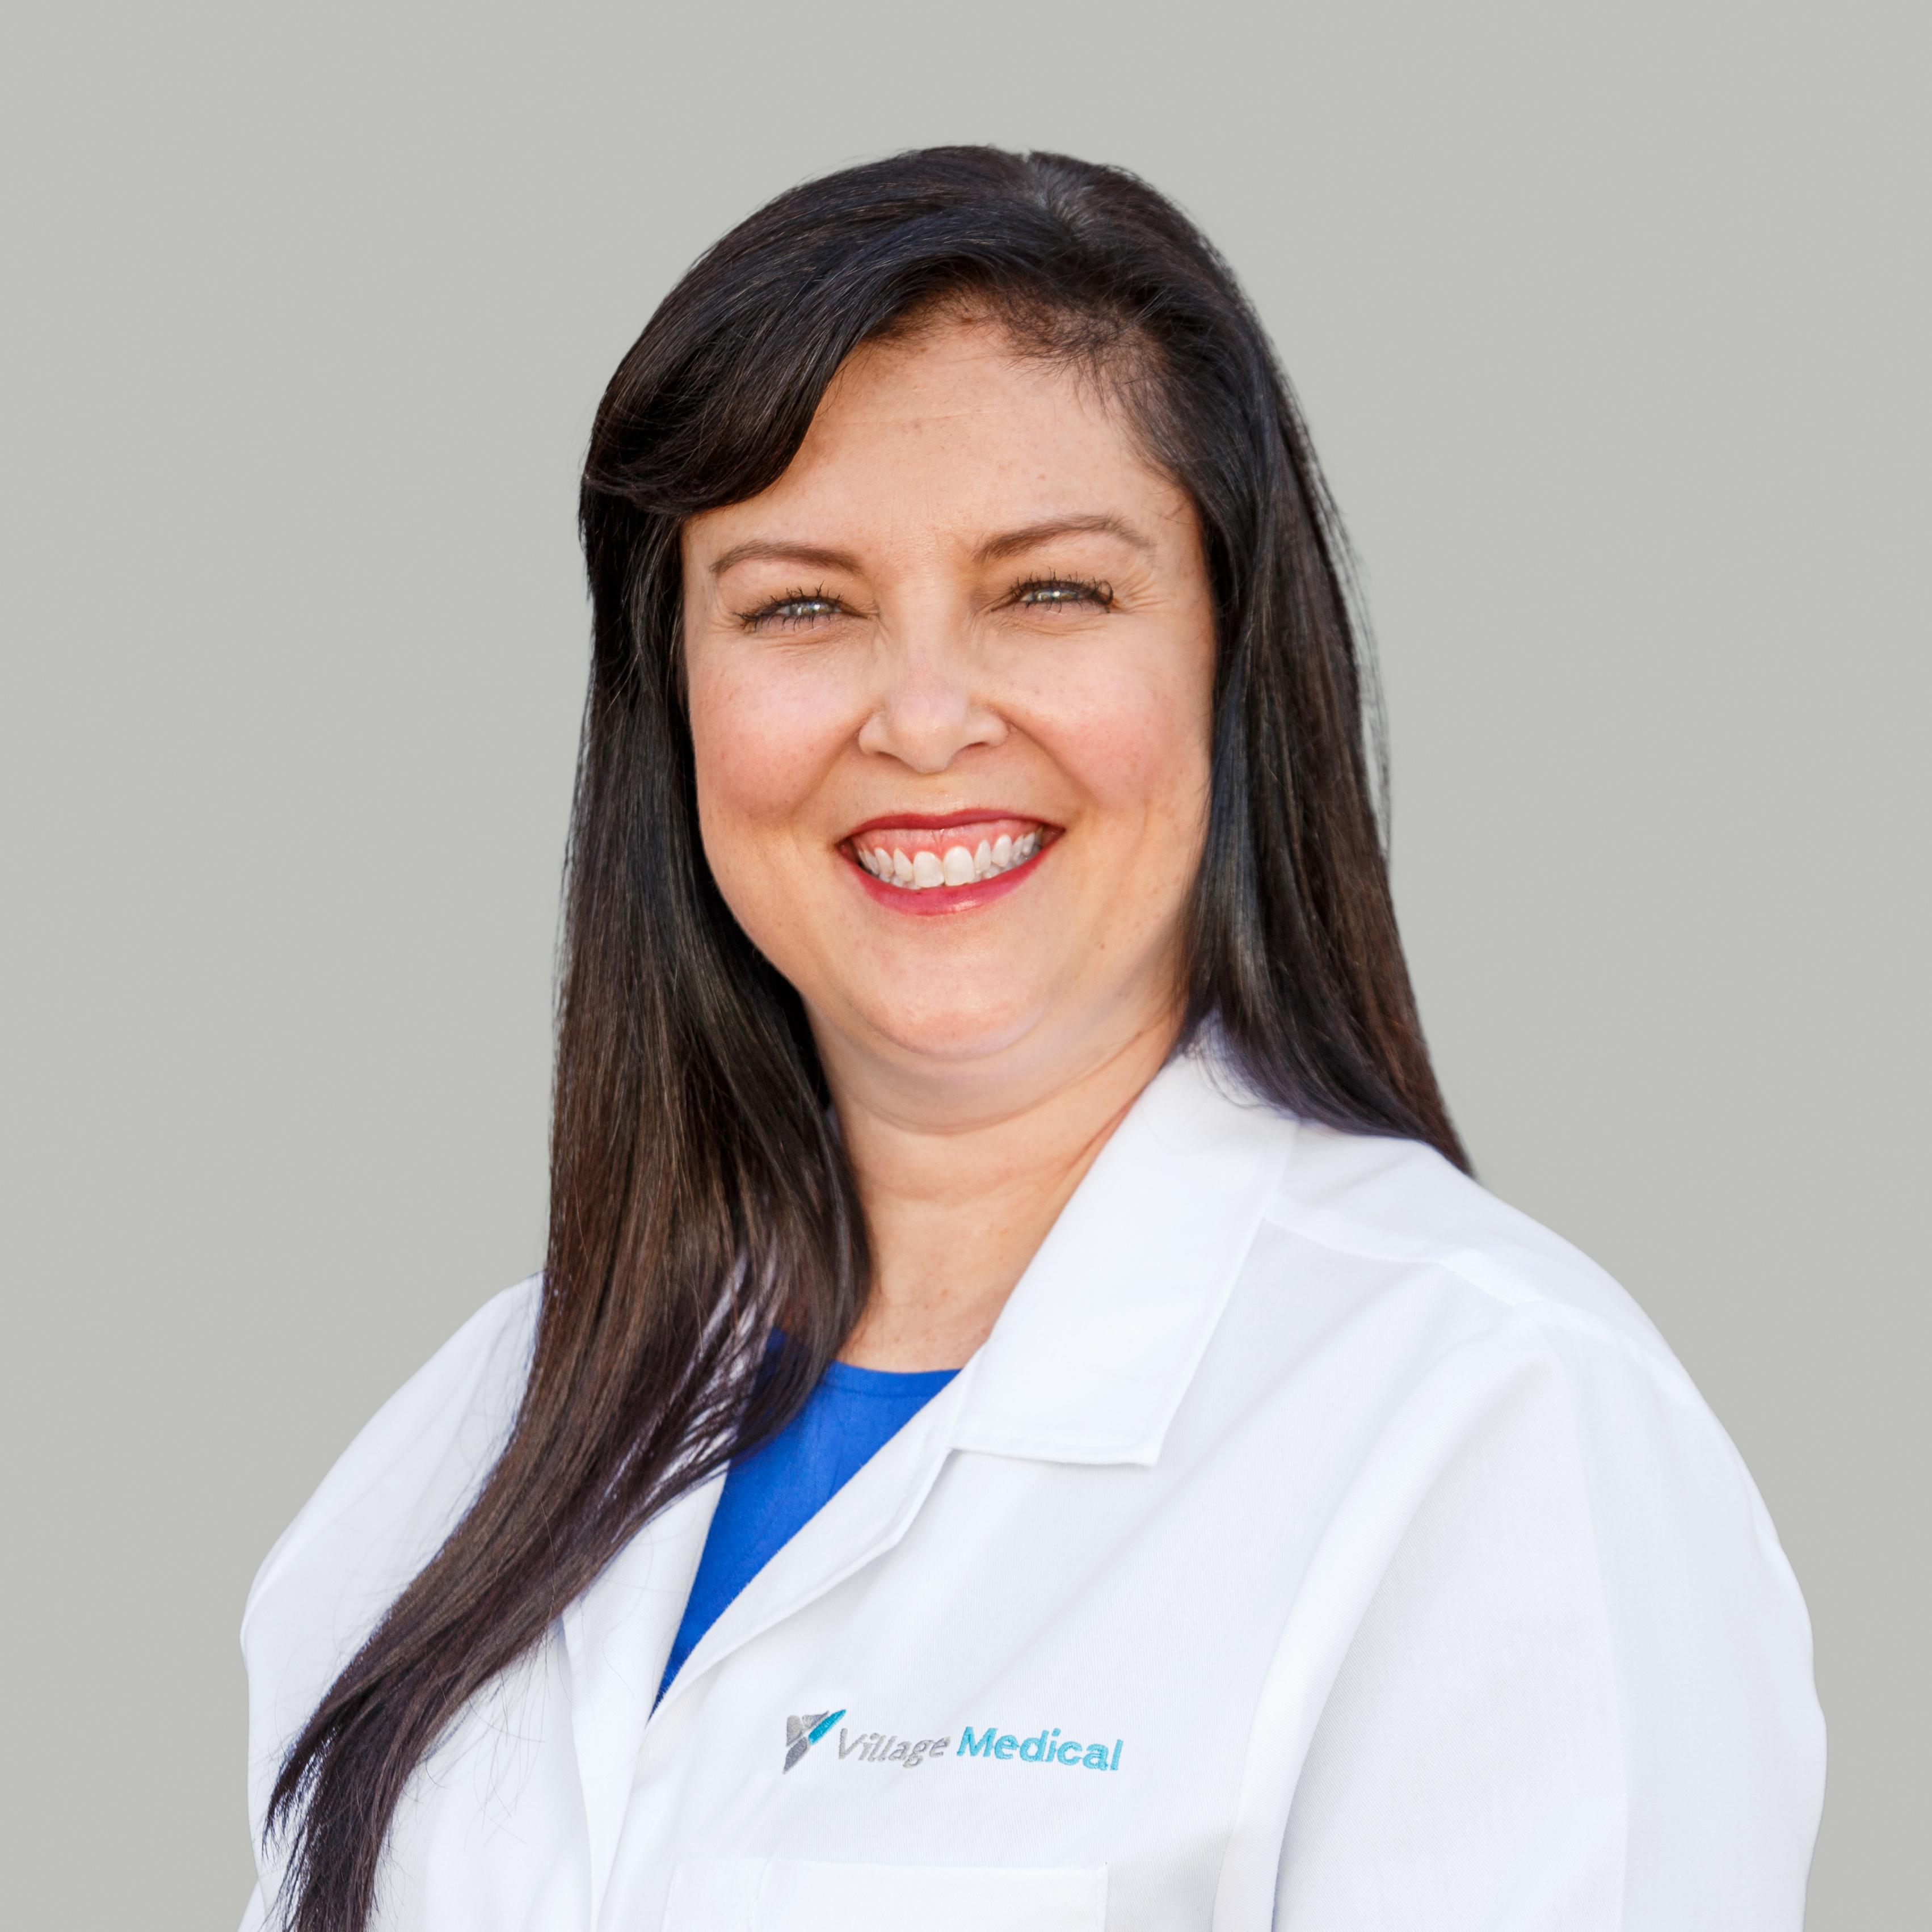 Karla Turley, MD